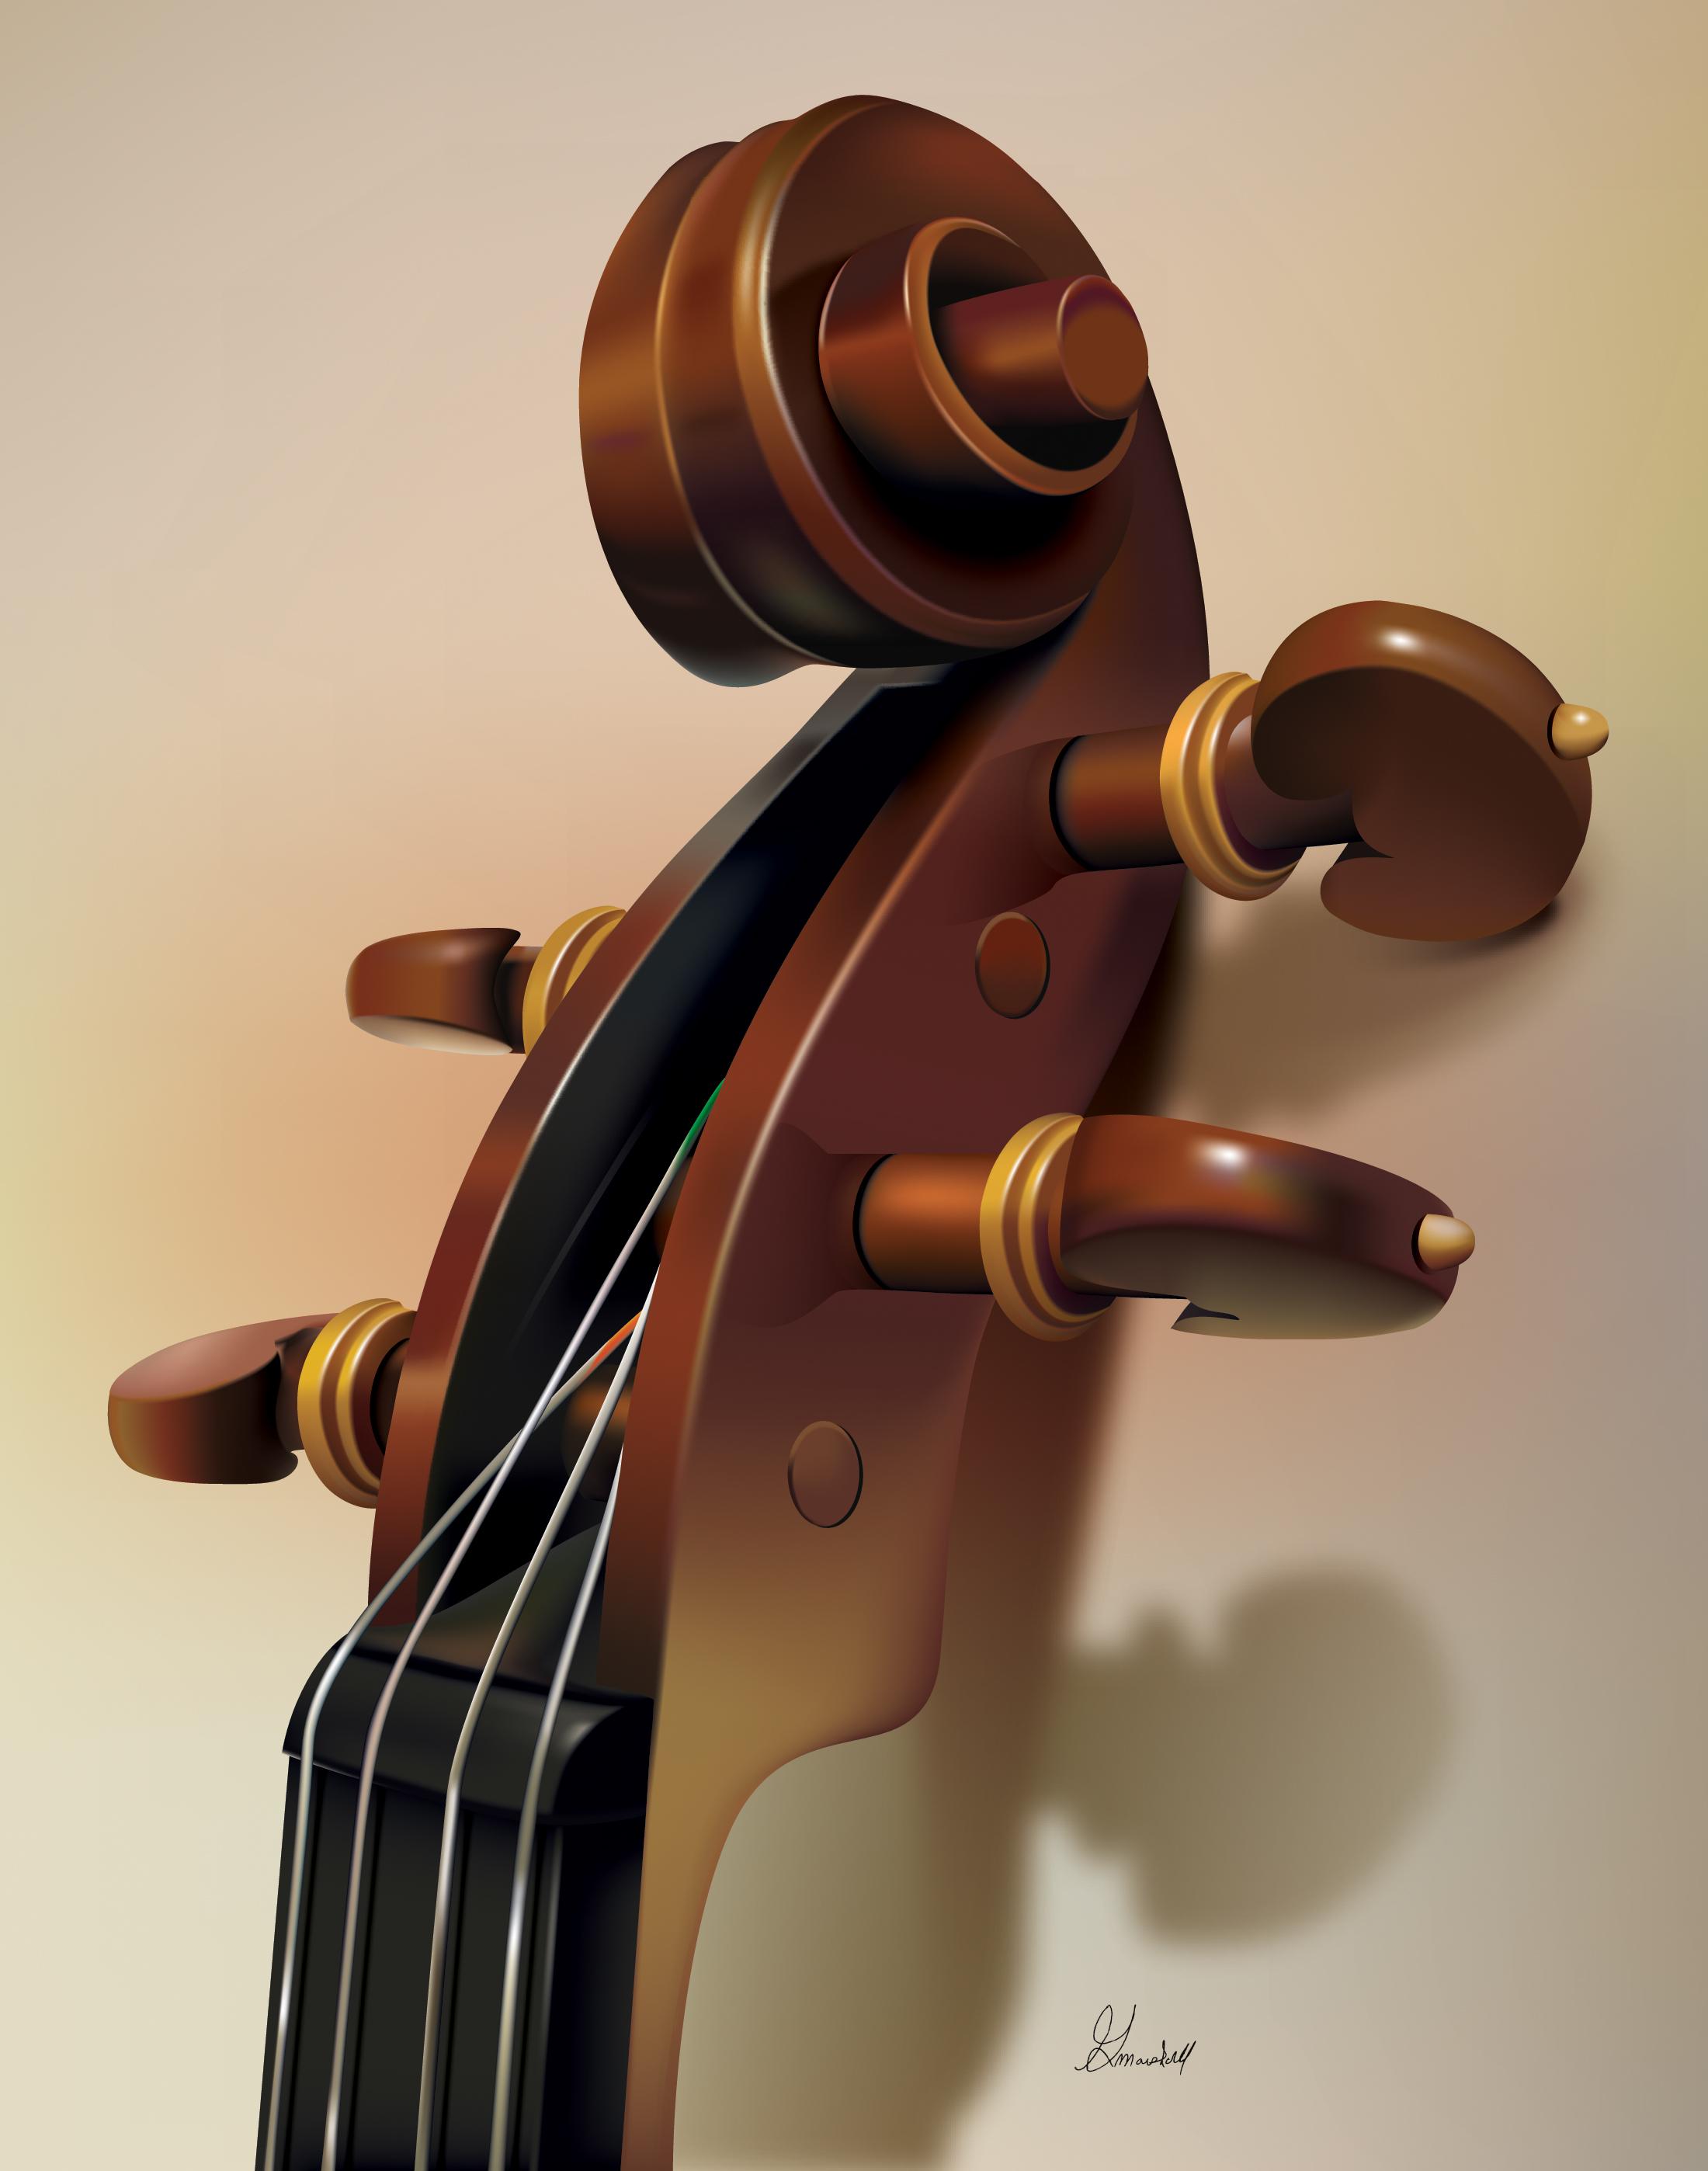 Violin Detail